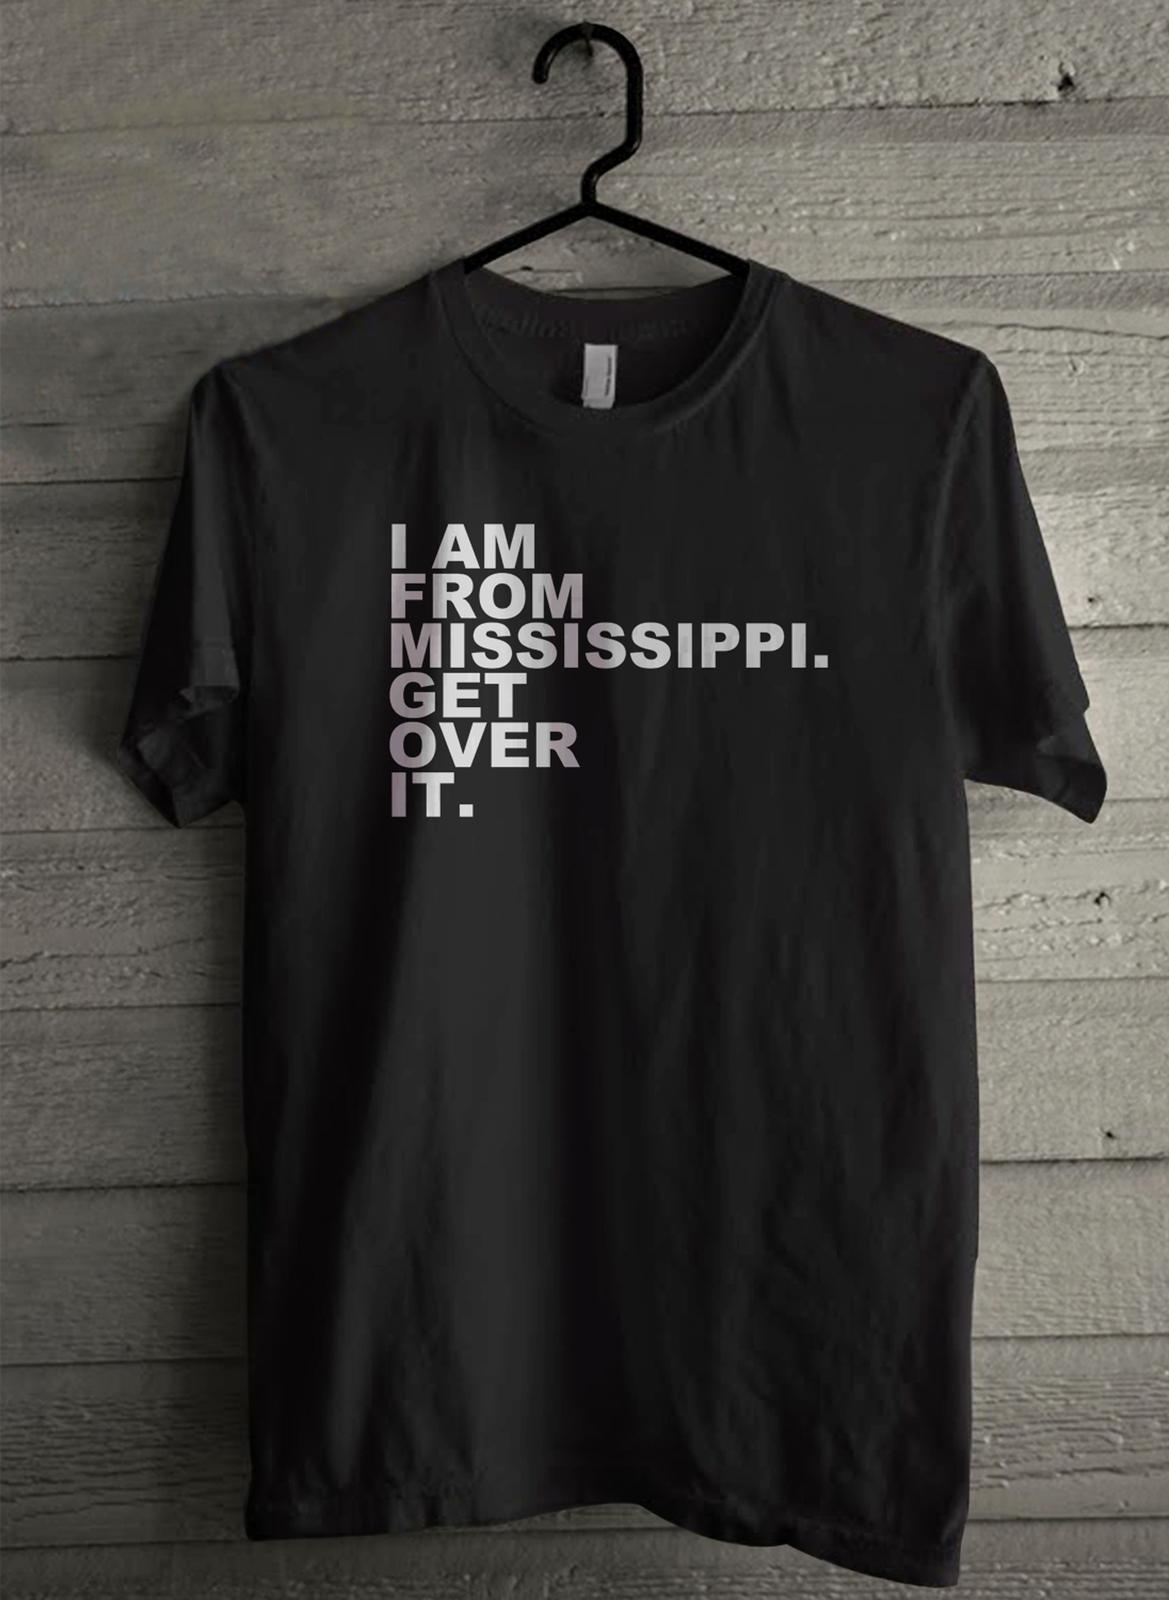 Mississipi state